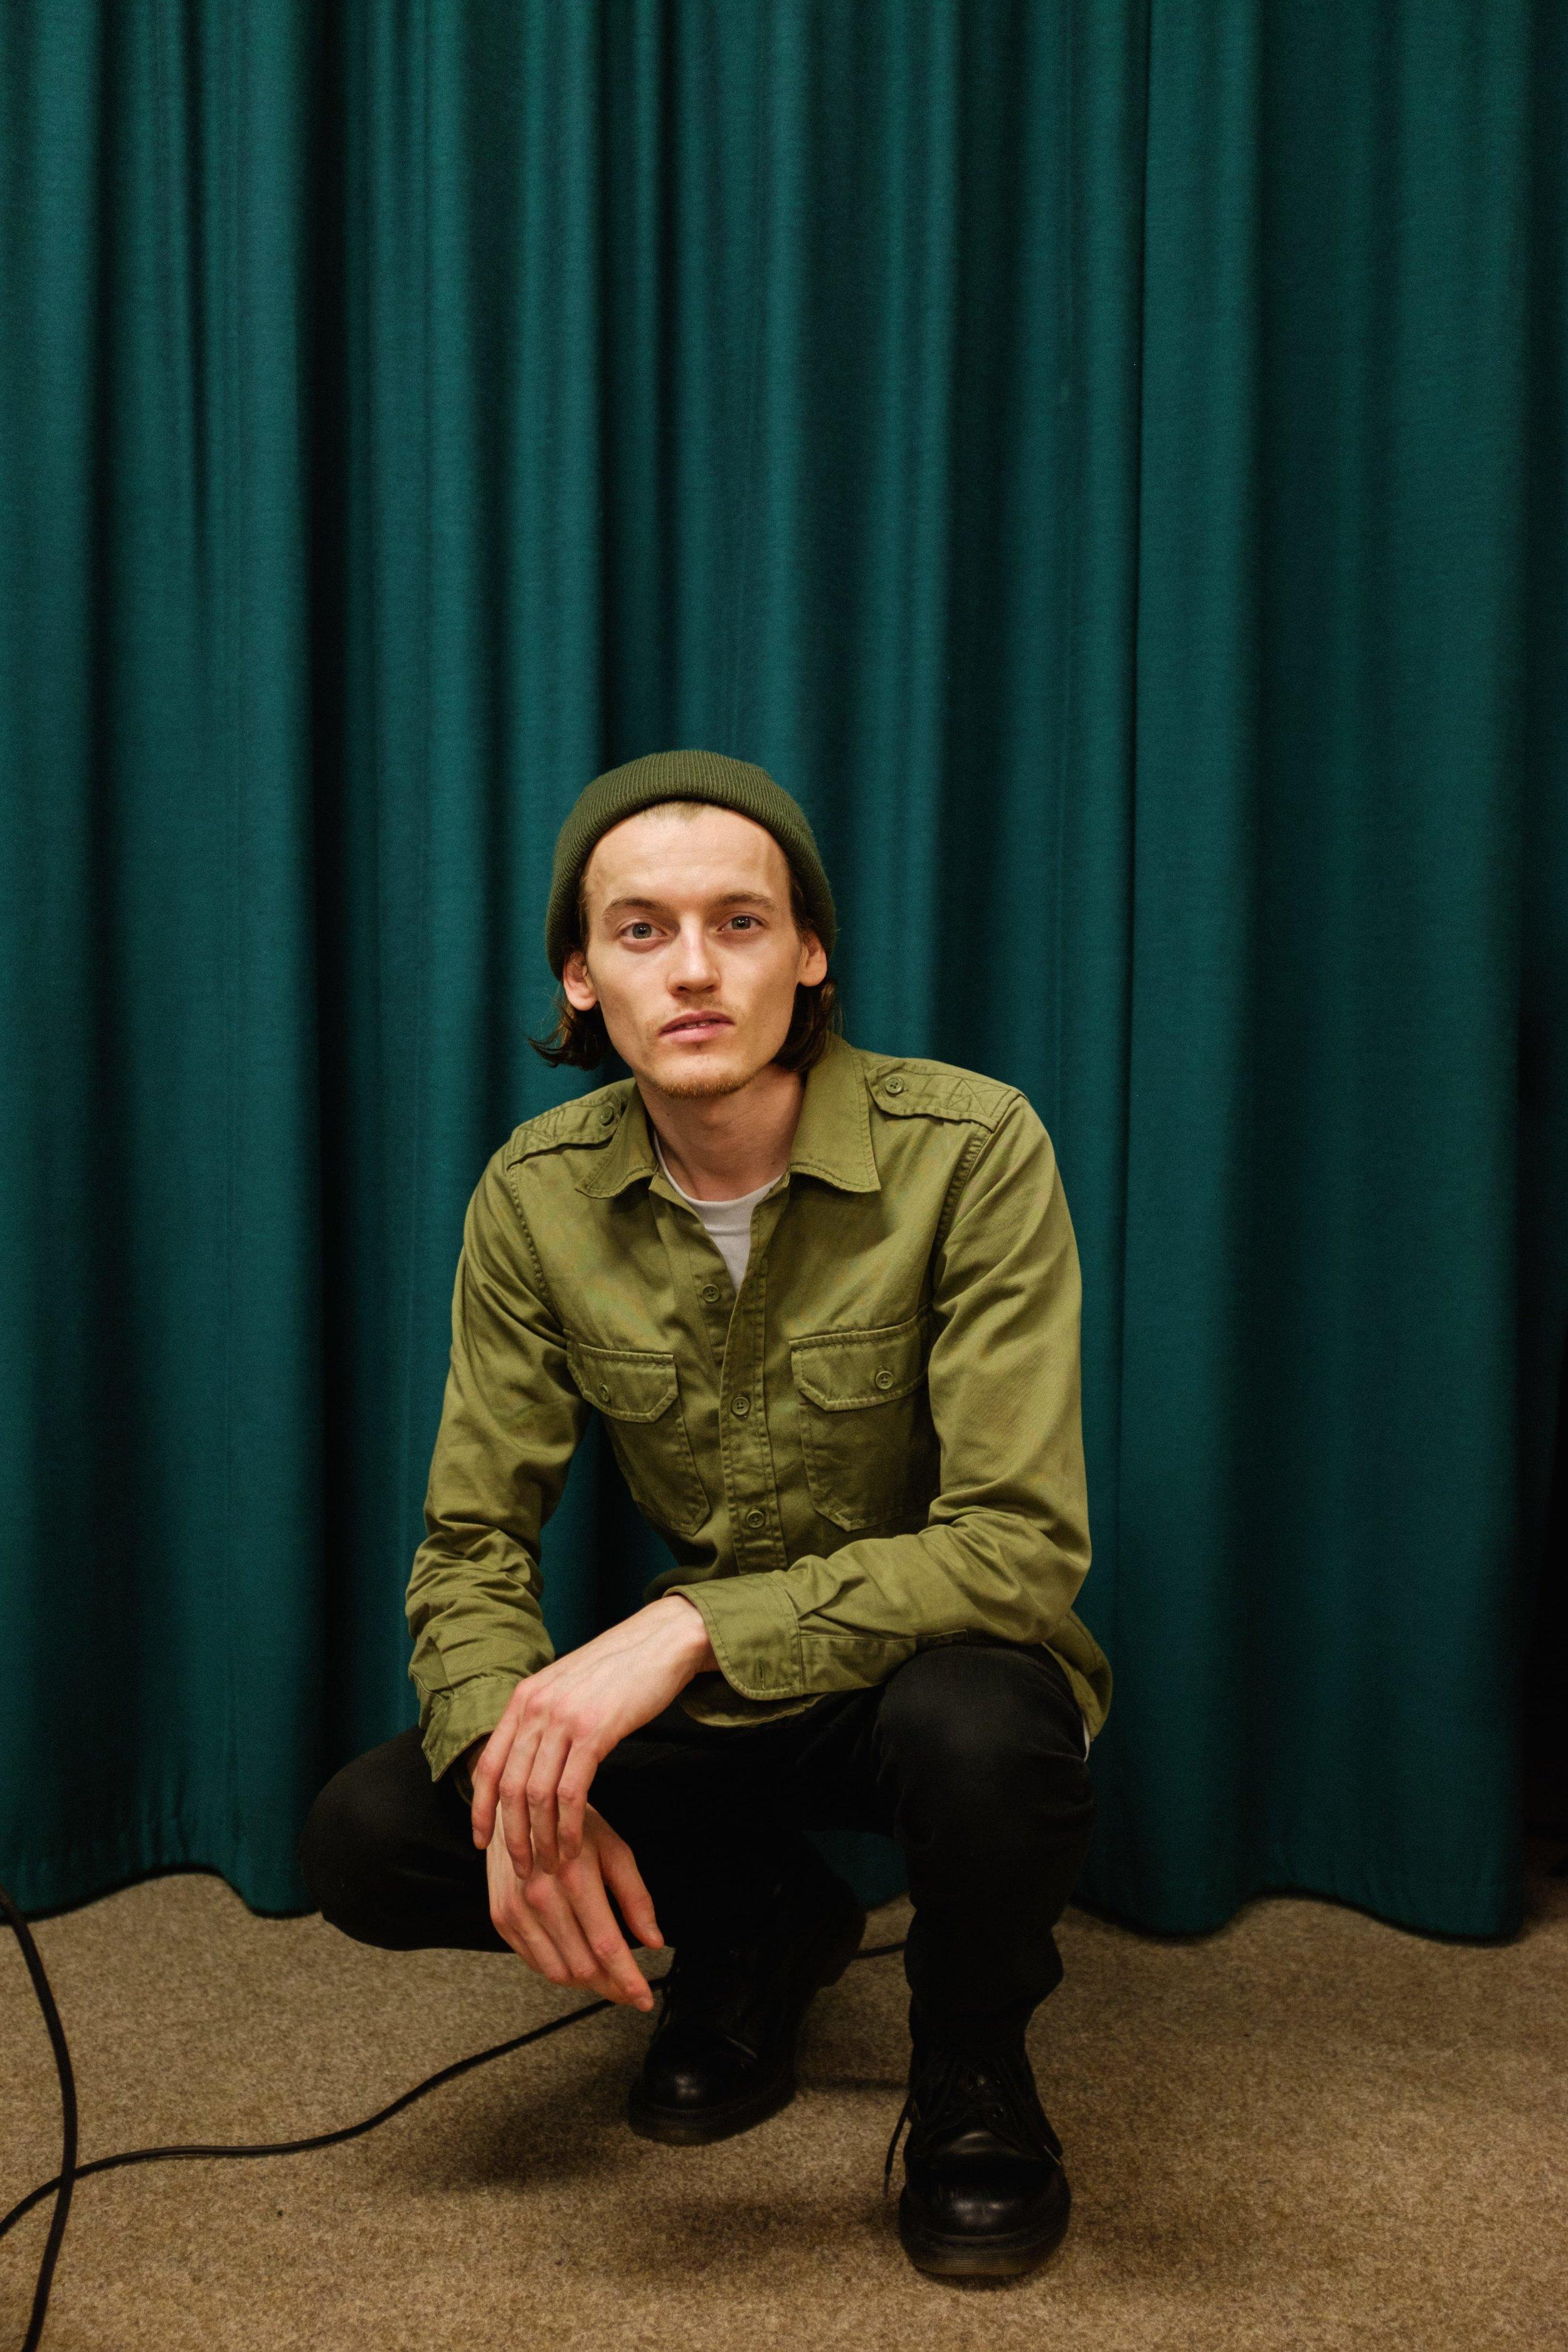 Musician + singer, Lee Reidy